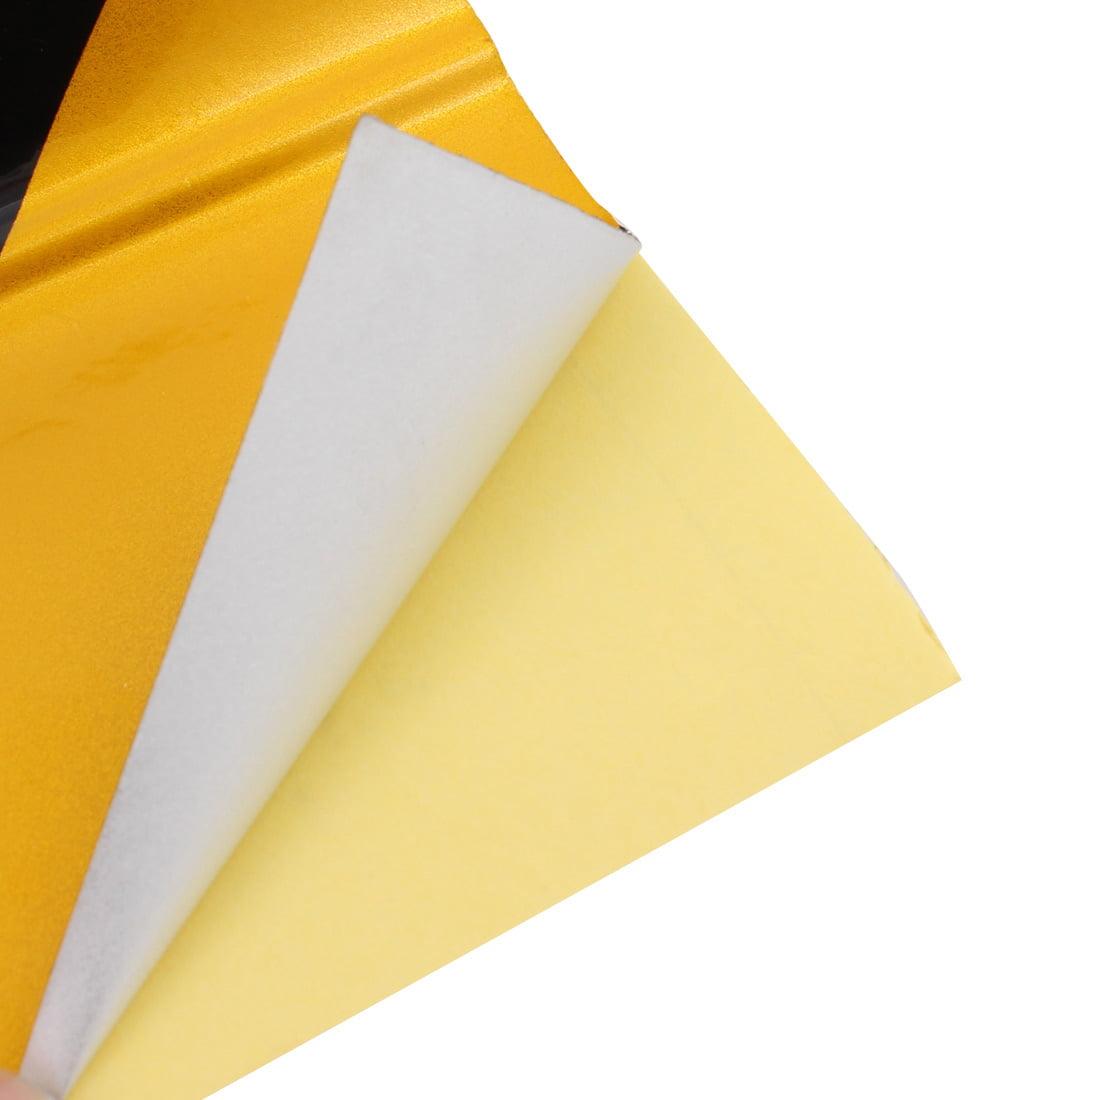 15cm x 2M Single Sided Adhesive Reflective  Warning Tape Tilt Black Yellow - image 1 of 3